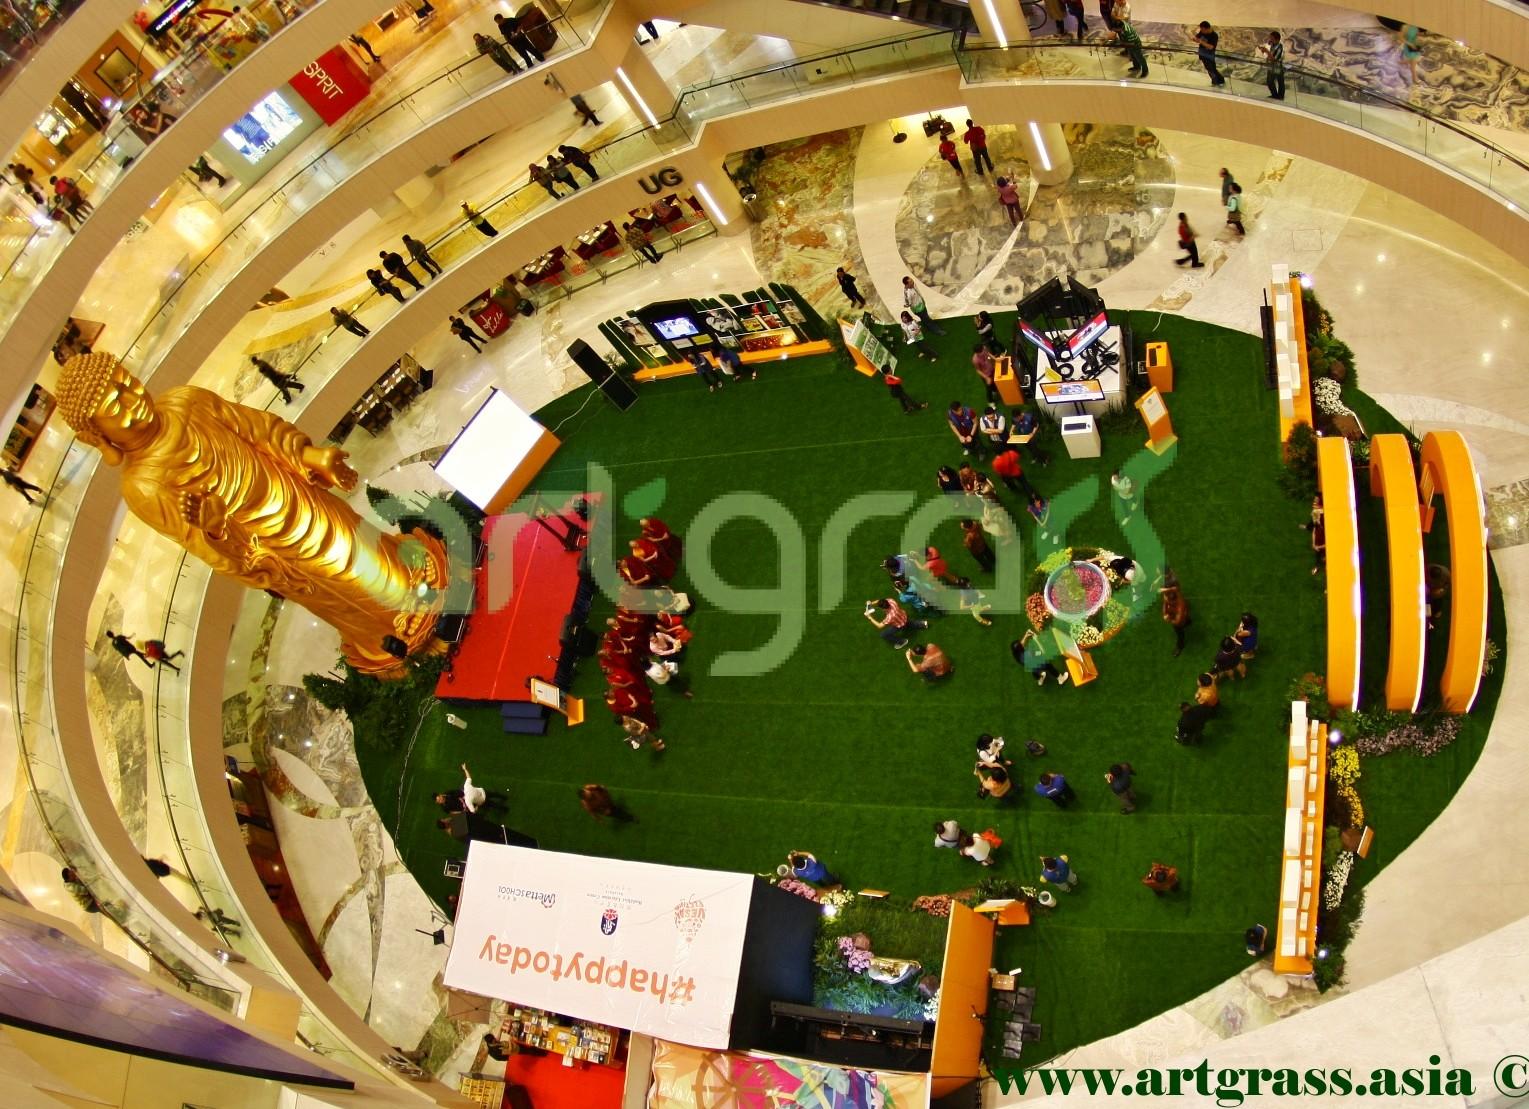 ArtGrass-At-Vesak-Festival-2015-Main-Atrium-Tunjungan-Plaza-28Mei-2015-Sideview